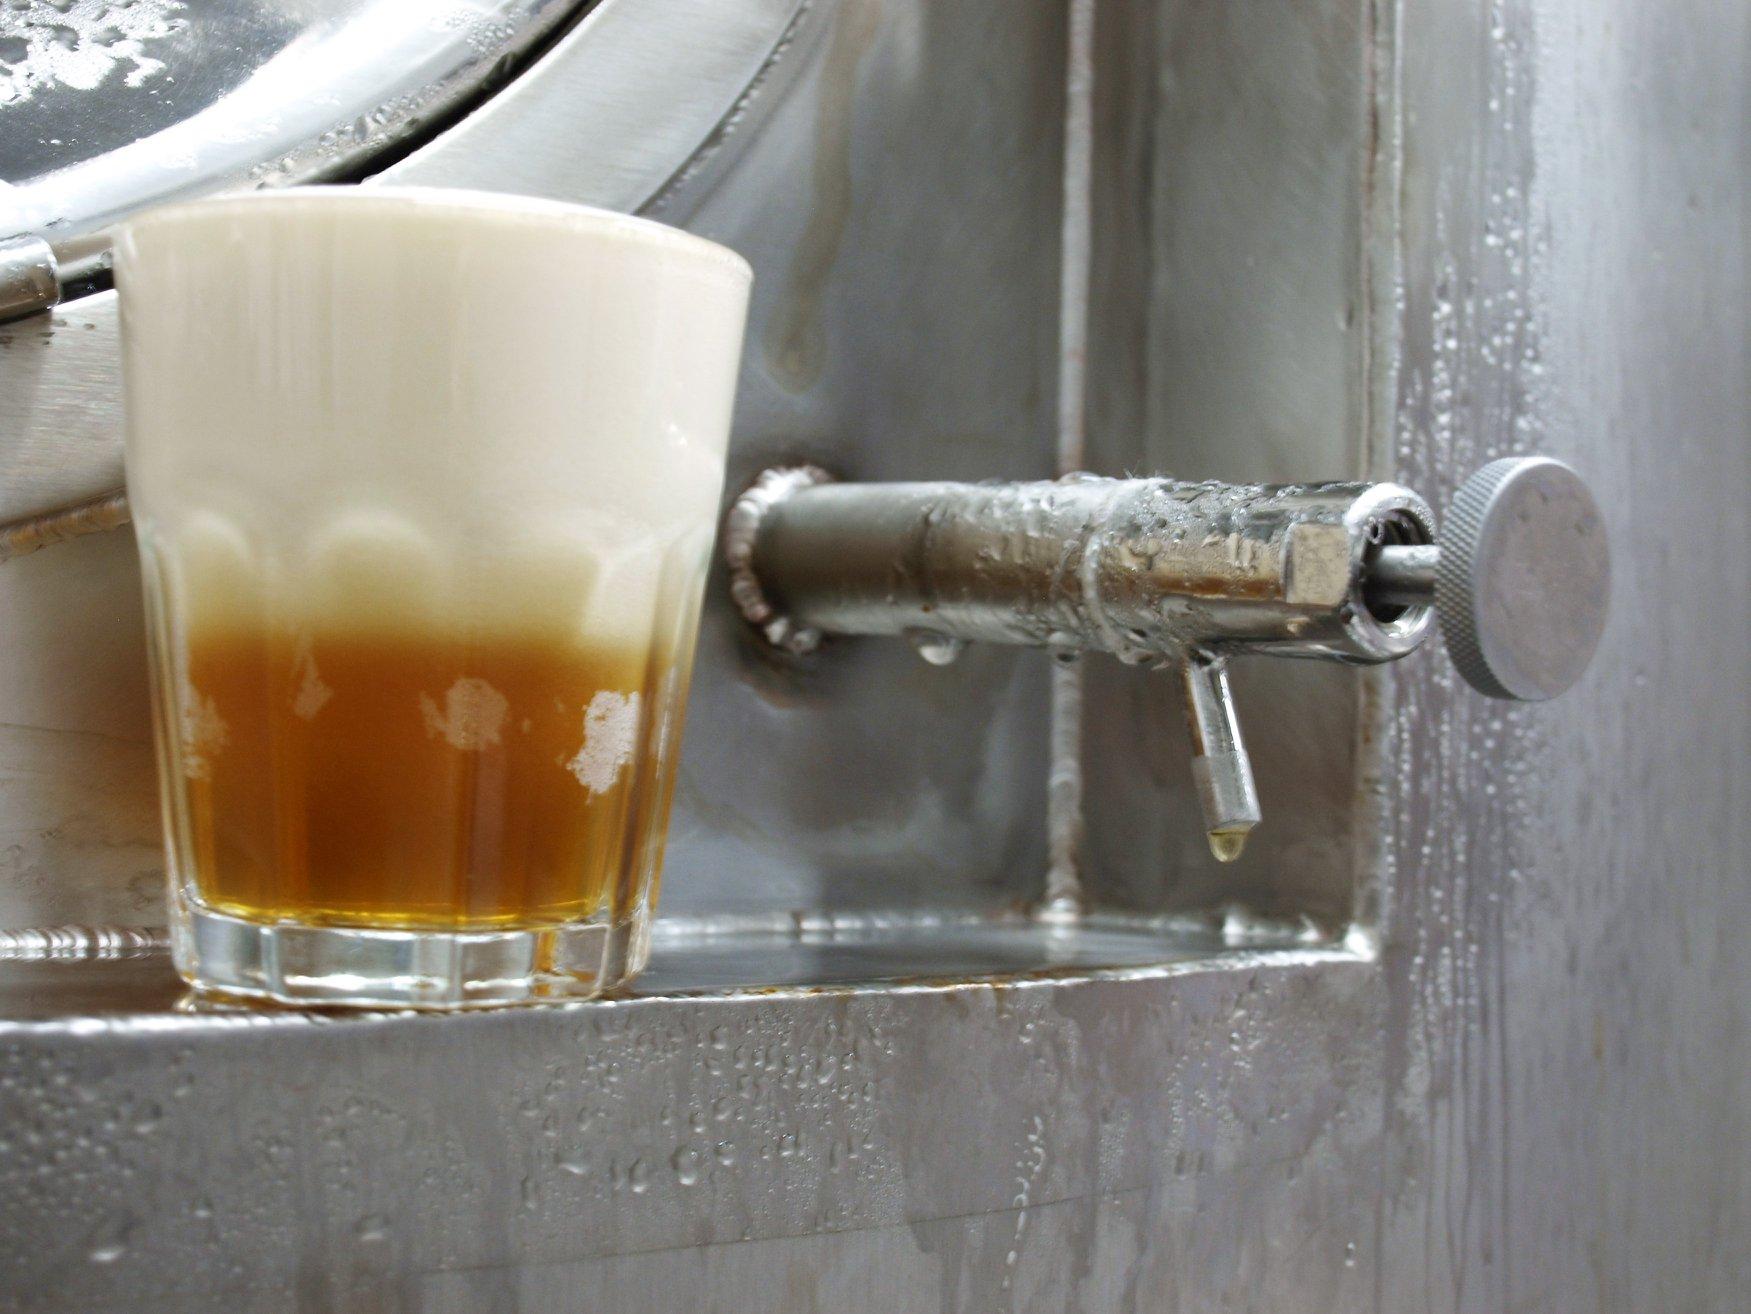 pivovari-pivovary-pivni-akce-4-vyroci-pivovaru-husar-kovalovice